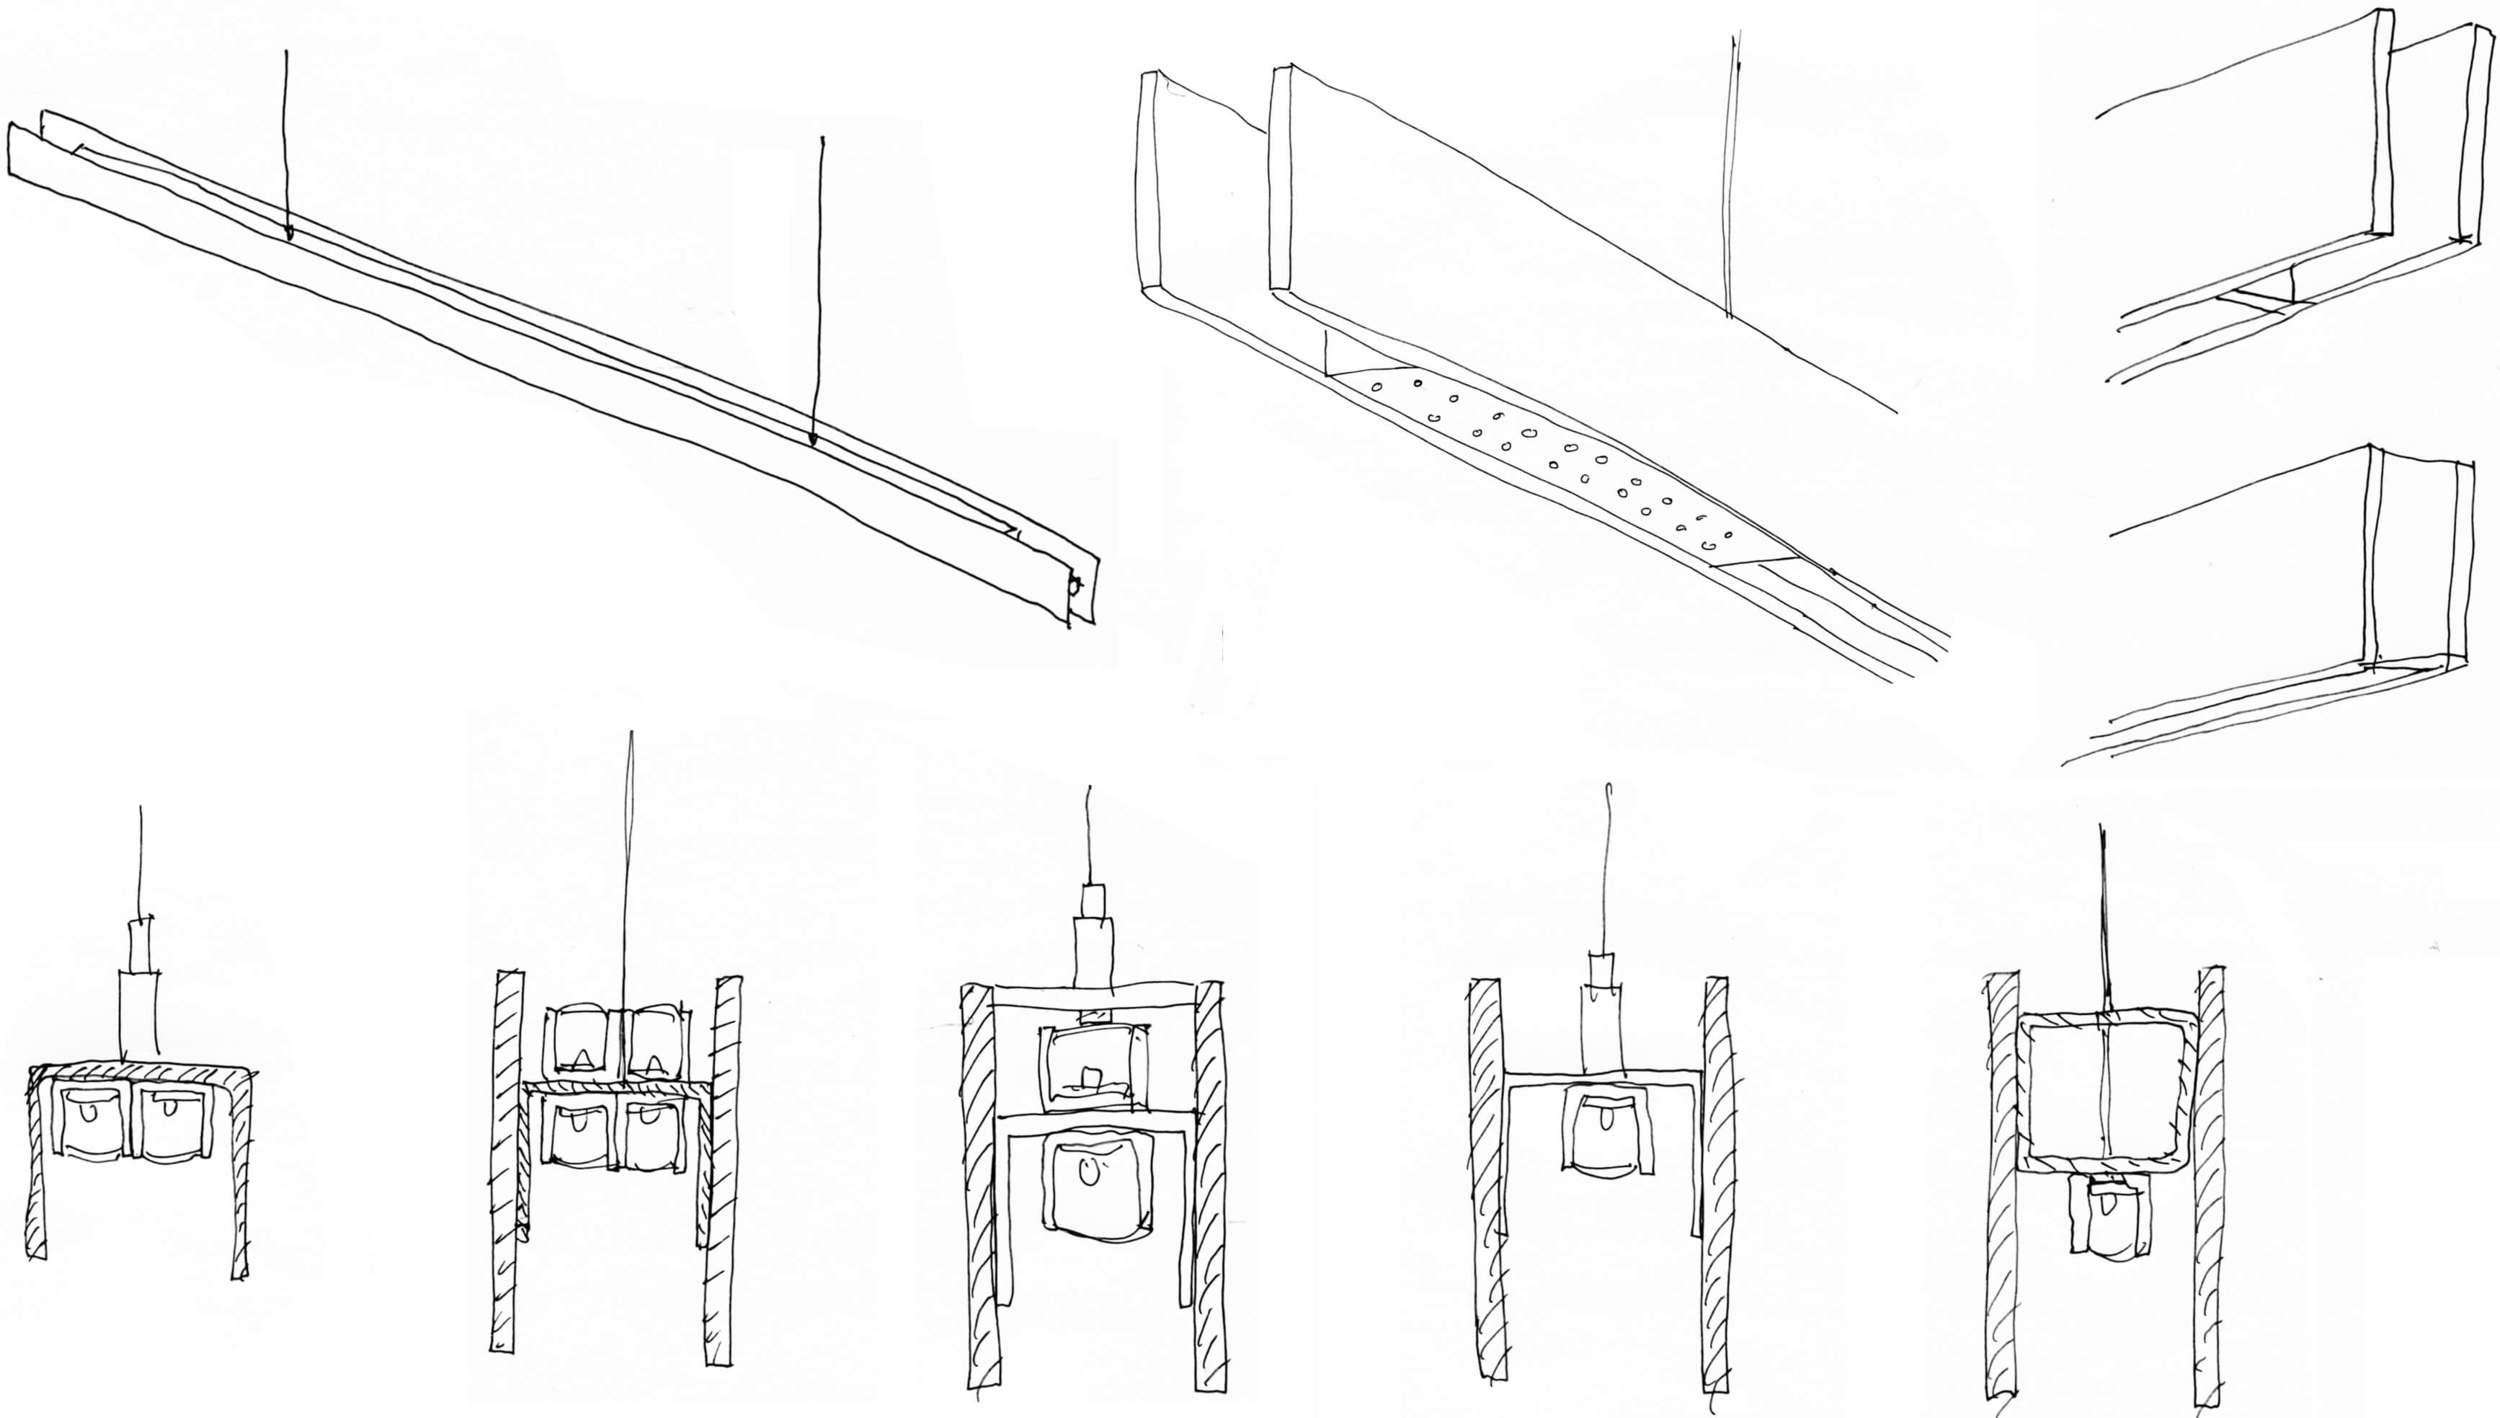 Dundon-passivhaus-bizley-somerset-architect-brass-pendant-light-sketches.jpg